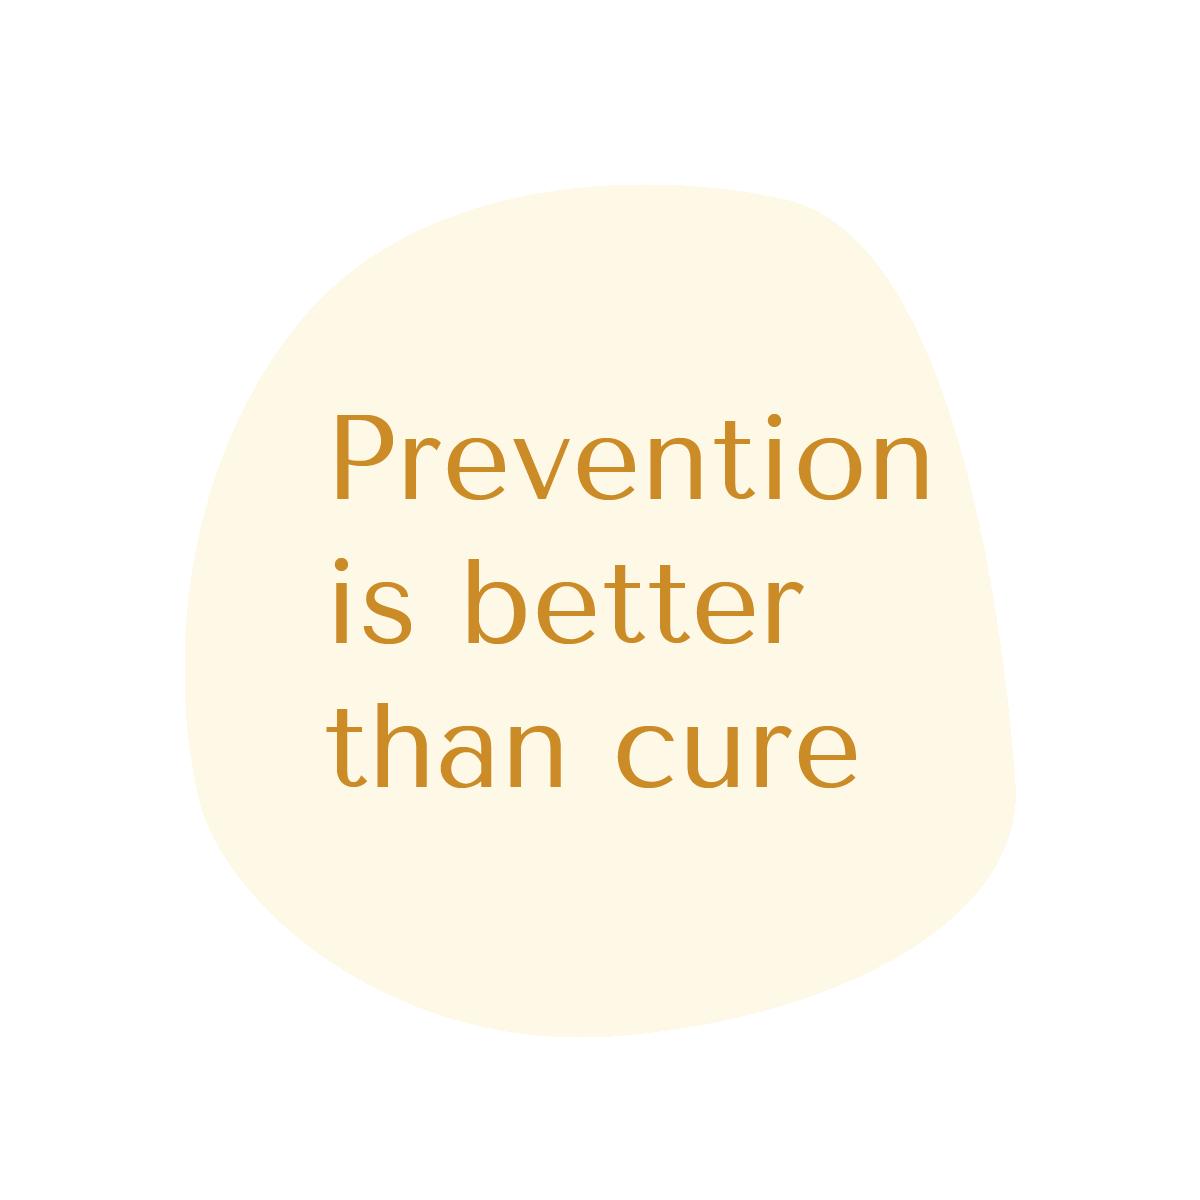 surry hills dental preventative quote